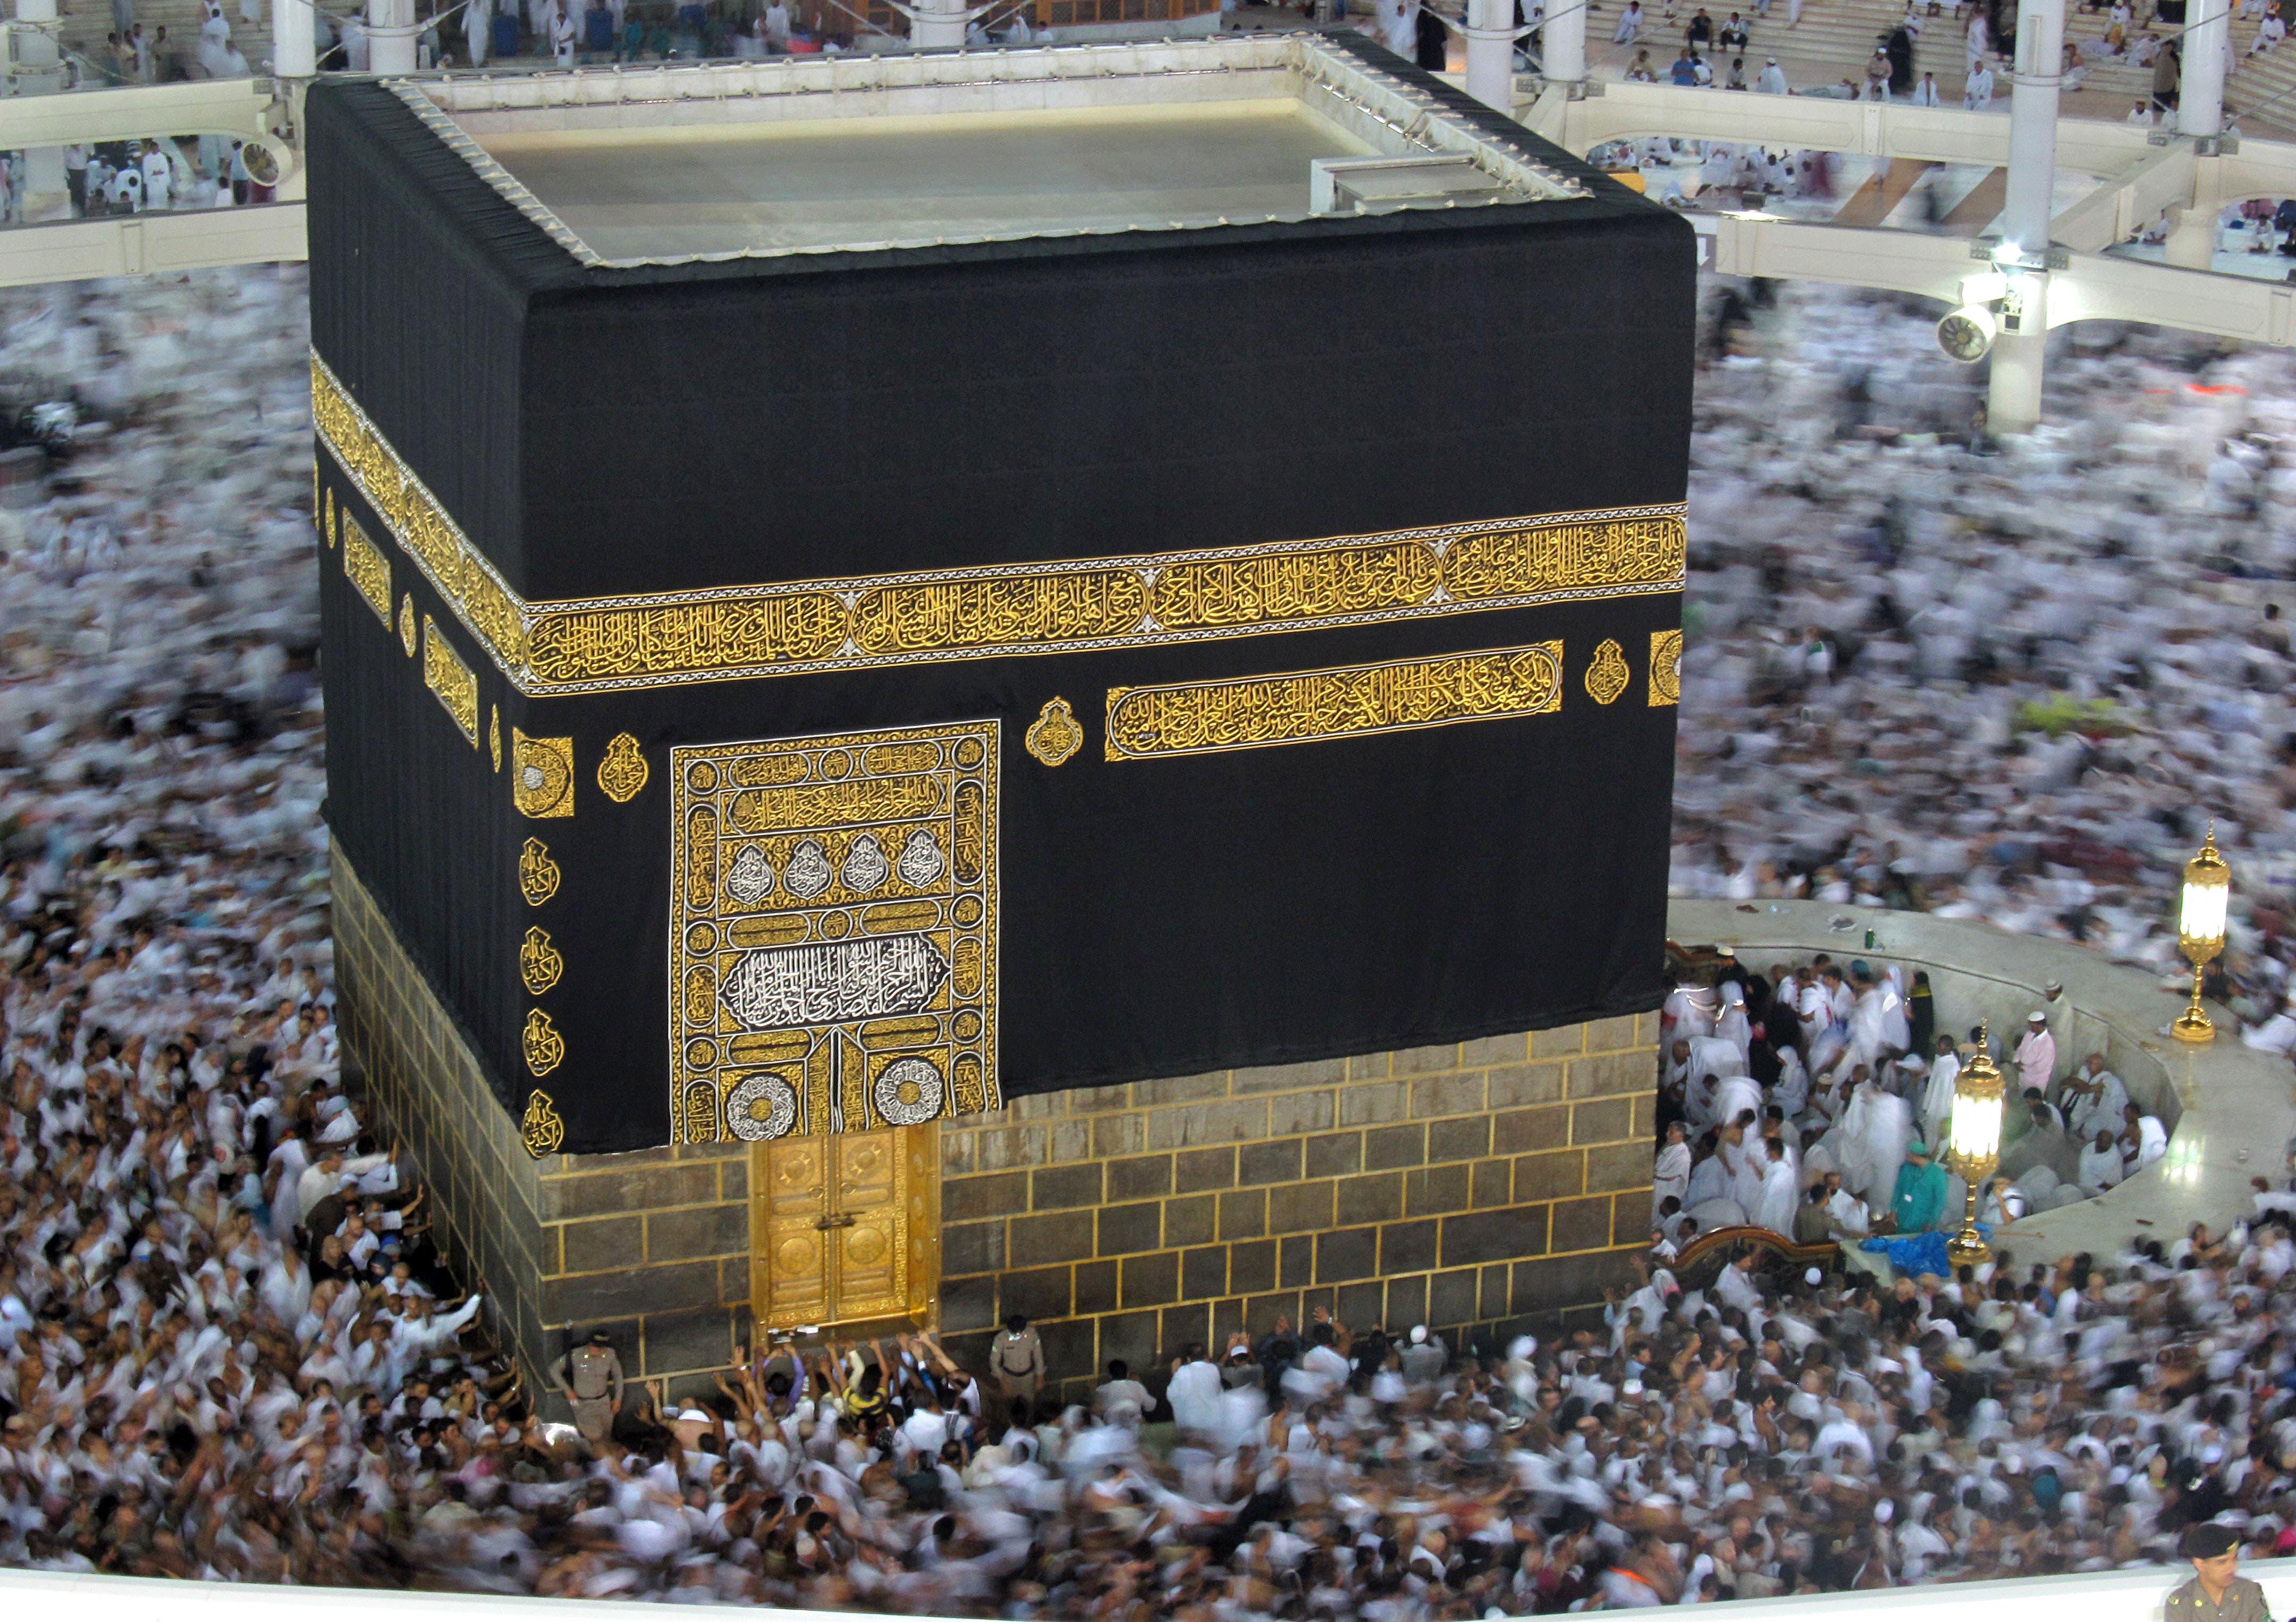 Arab World S Top Mosques Ready For Eid Al Fitr Prayers